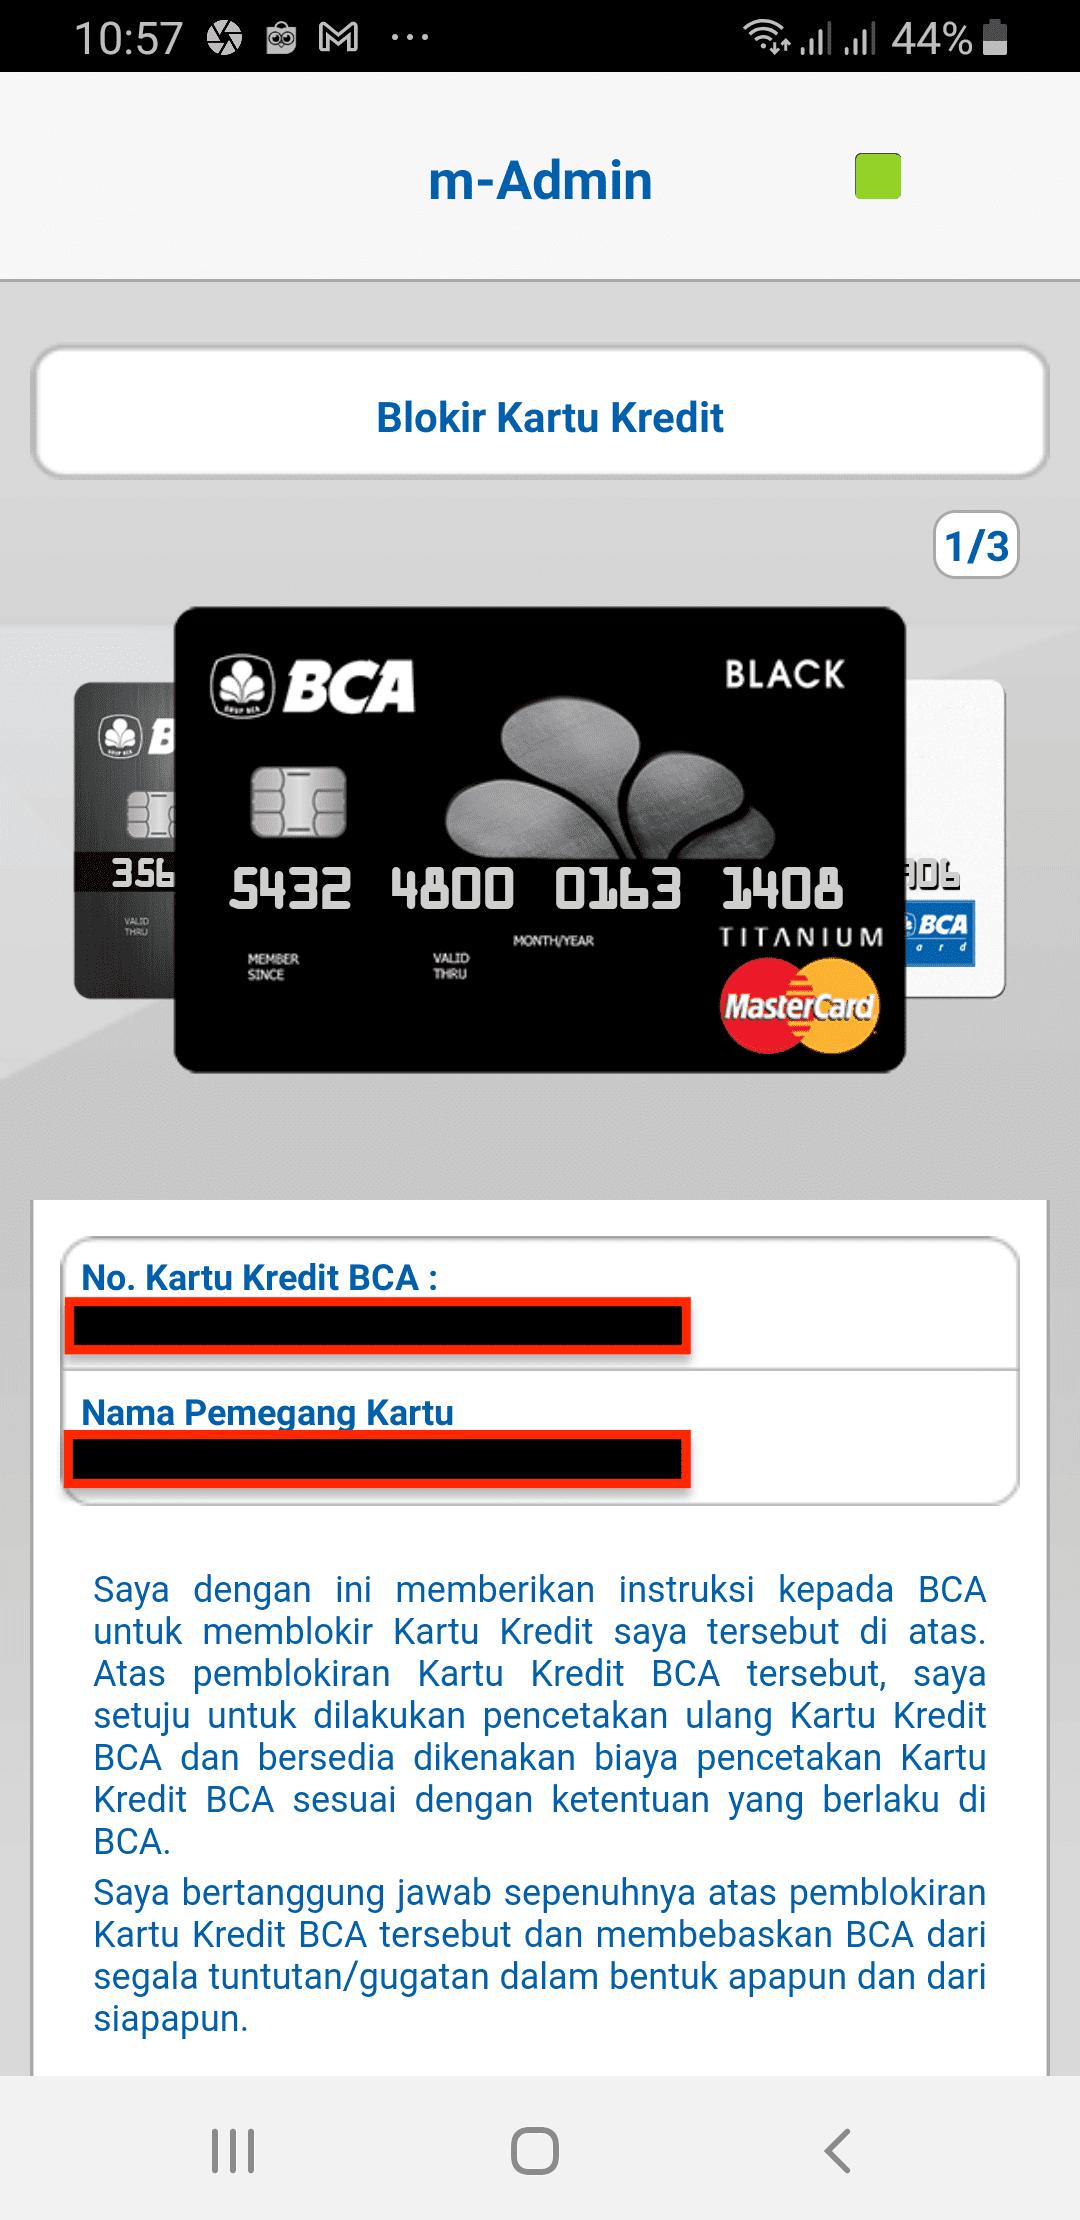 Blokir KK BCA Online